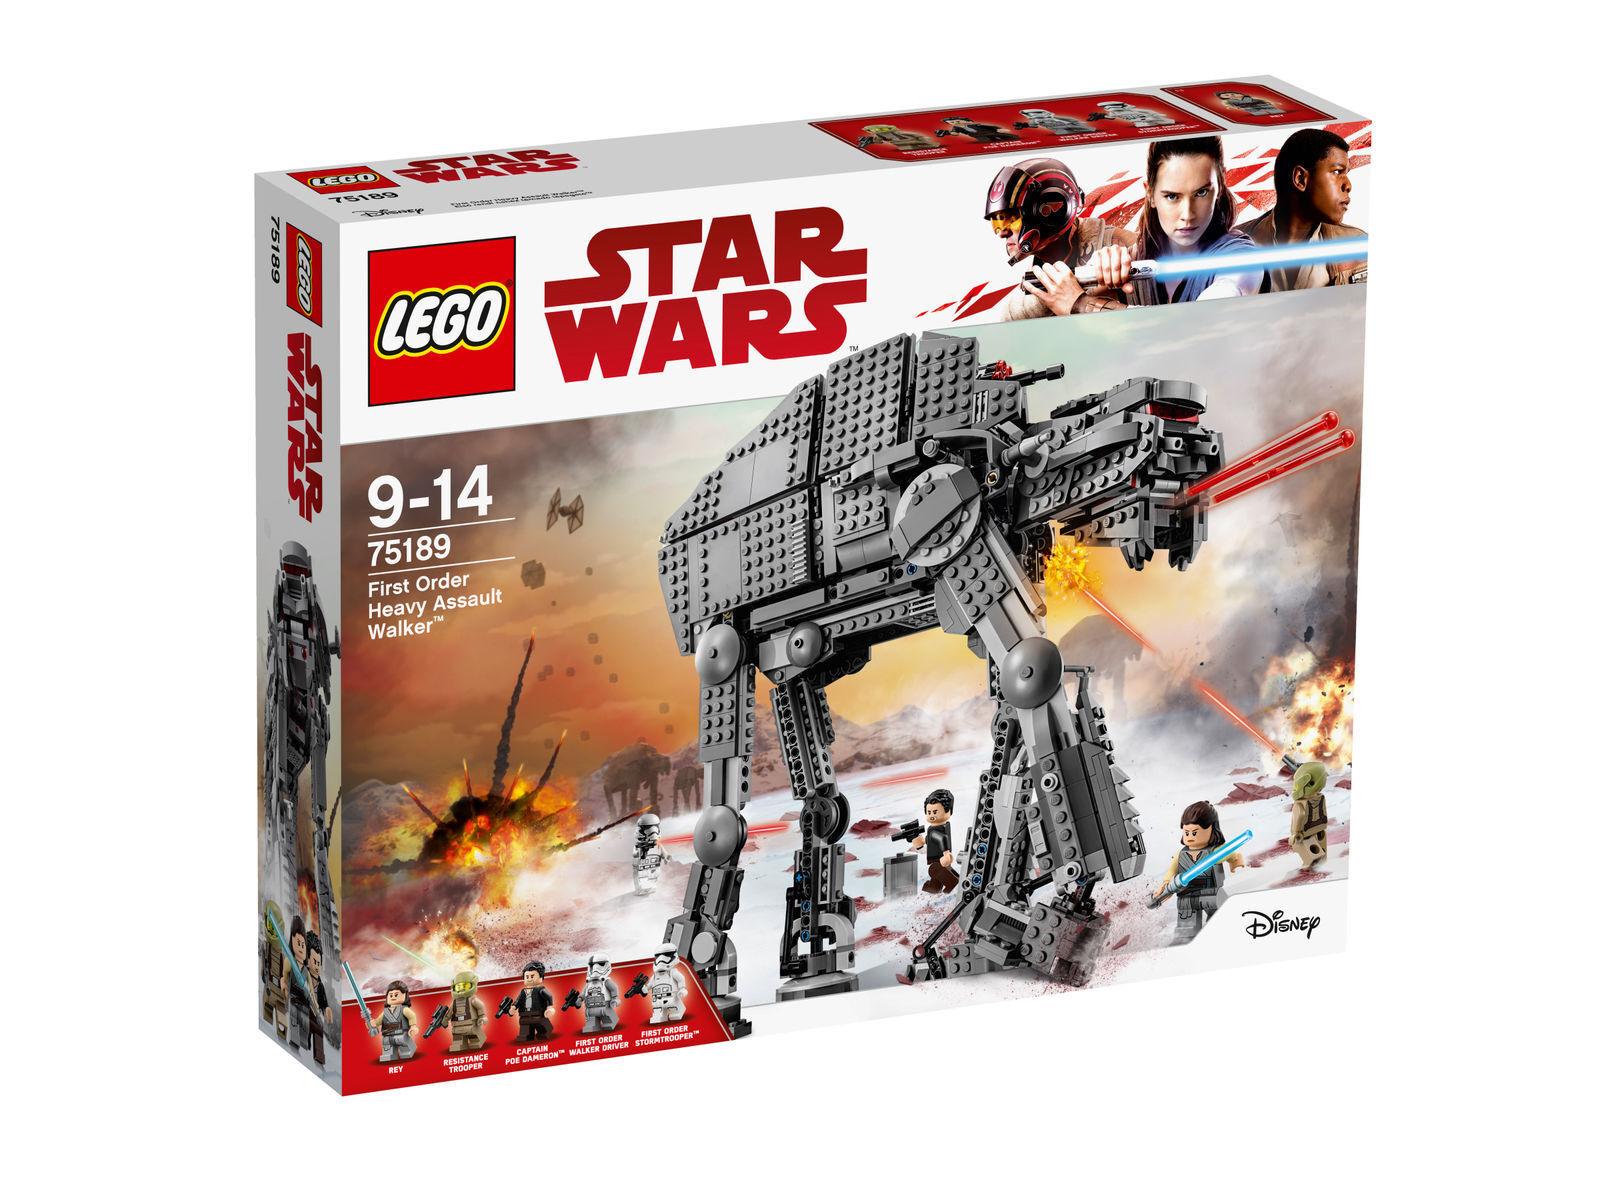 Lego Star Wars 75189 First Order Heavy  Assault Walker avec toutes les figurines neuf neuf dans sa boîte  excellent prix